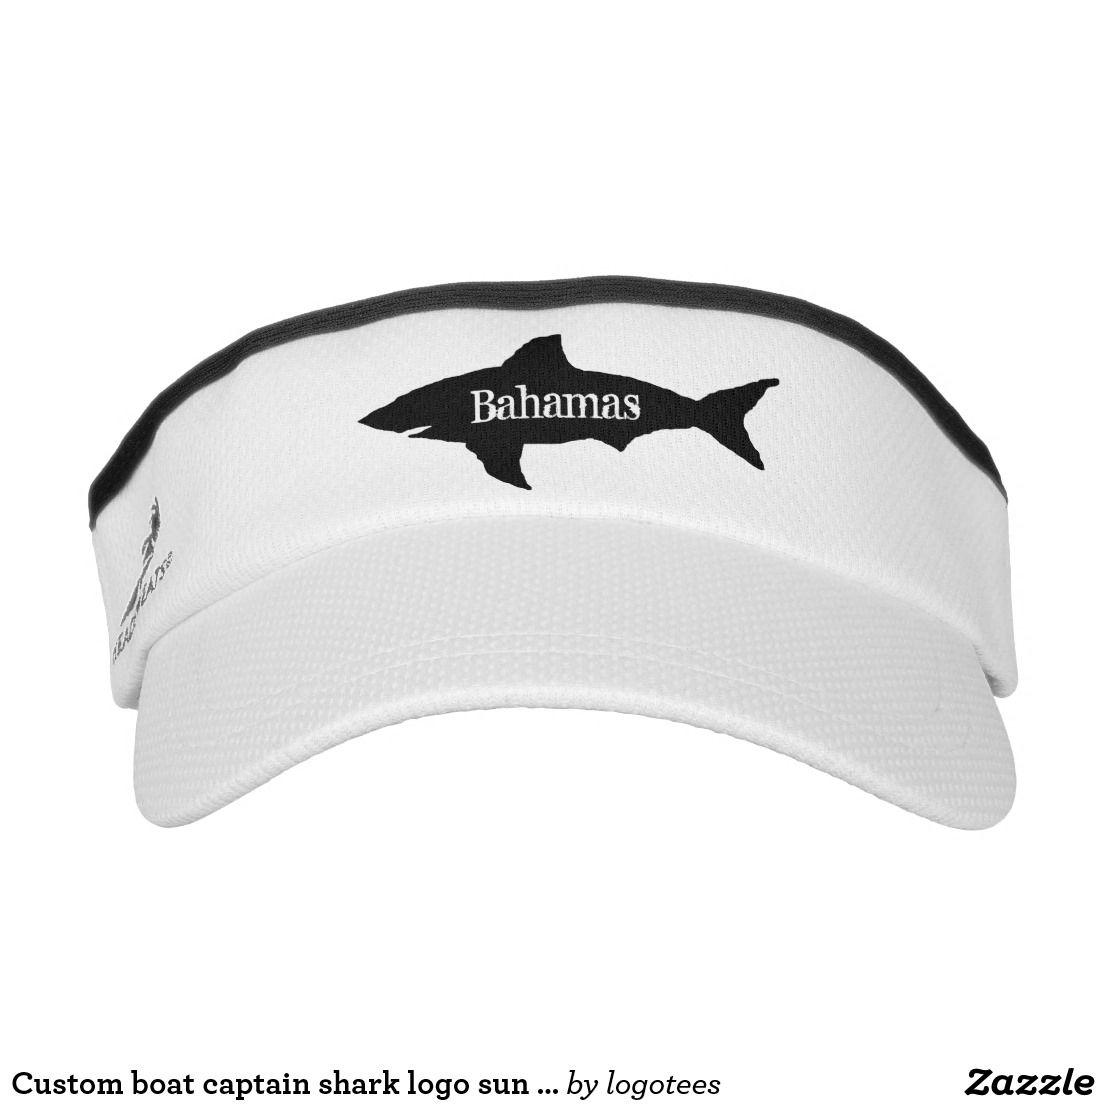 Custom boat captain shark logo sun visor cap hat | Zazzle com